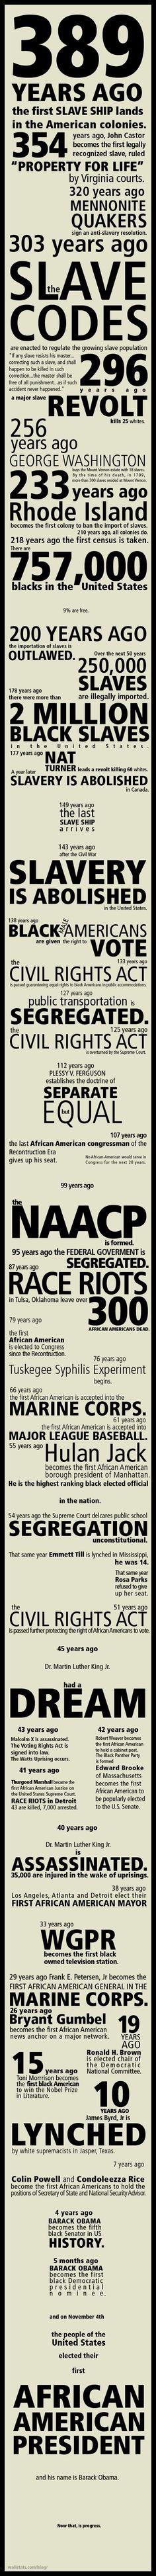 Black History 101